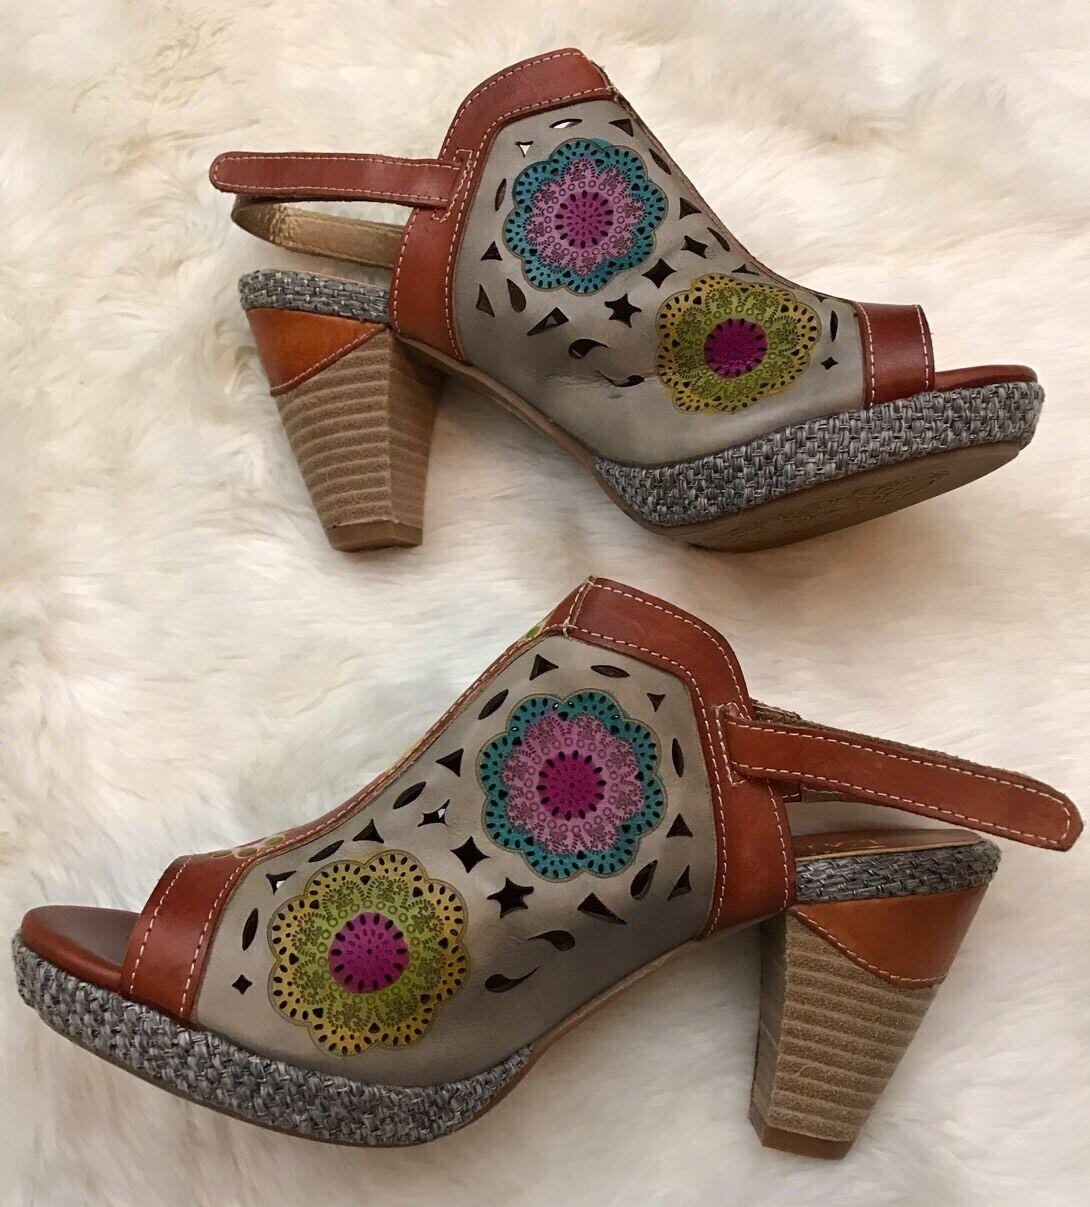 L'Artiste SPRING STEP Belen Heels Slingback Peep Toe QVC Sandals QVC Toe 42 10.5-11 978229